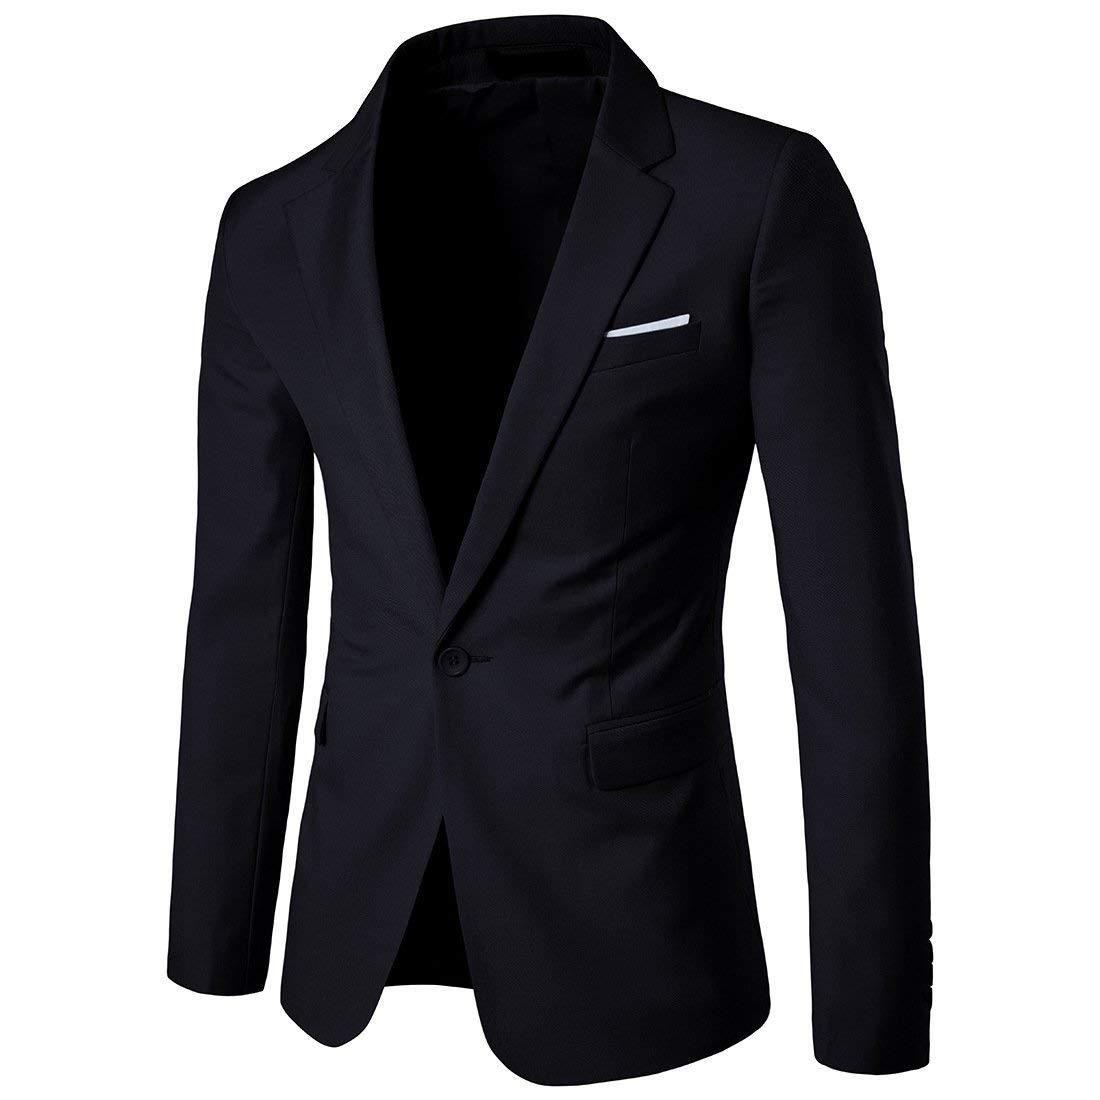 c249f870a99 WULFUL Men s Slim Fit Suit One Button Suit Coat Casual Business Lapel Blazers  Jacket